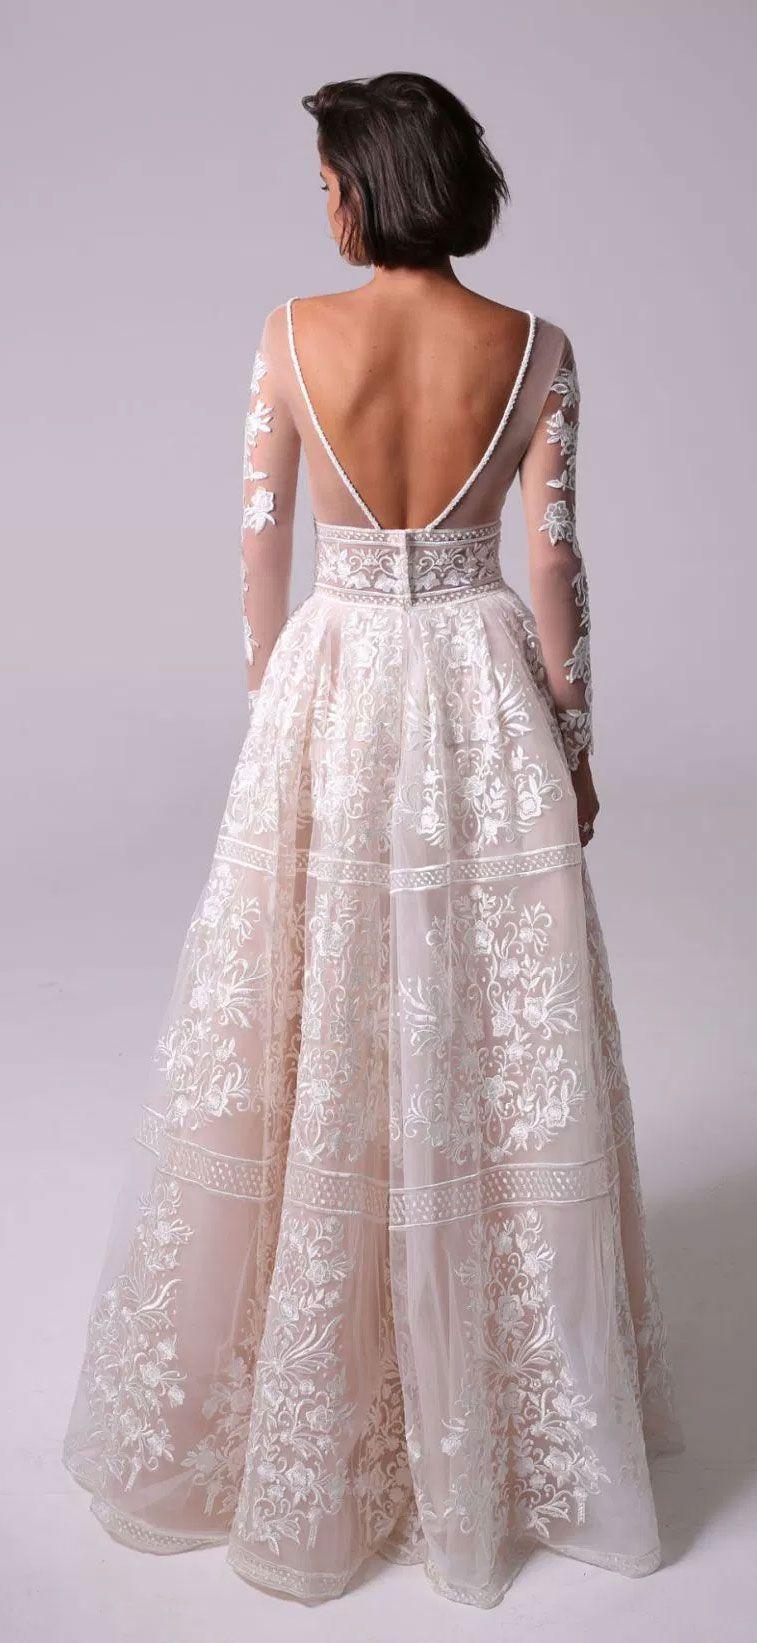 Michal medina wedding dresses vow renewal pinterest ball